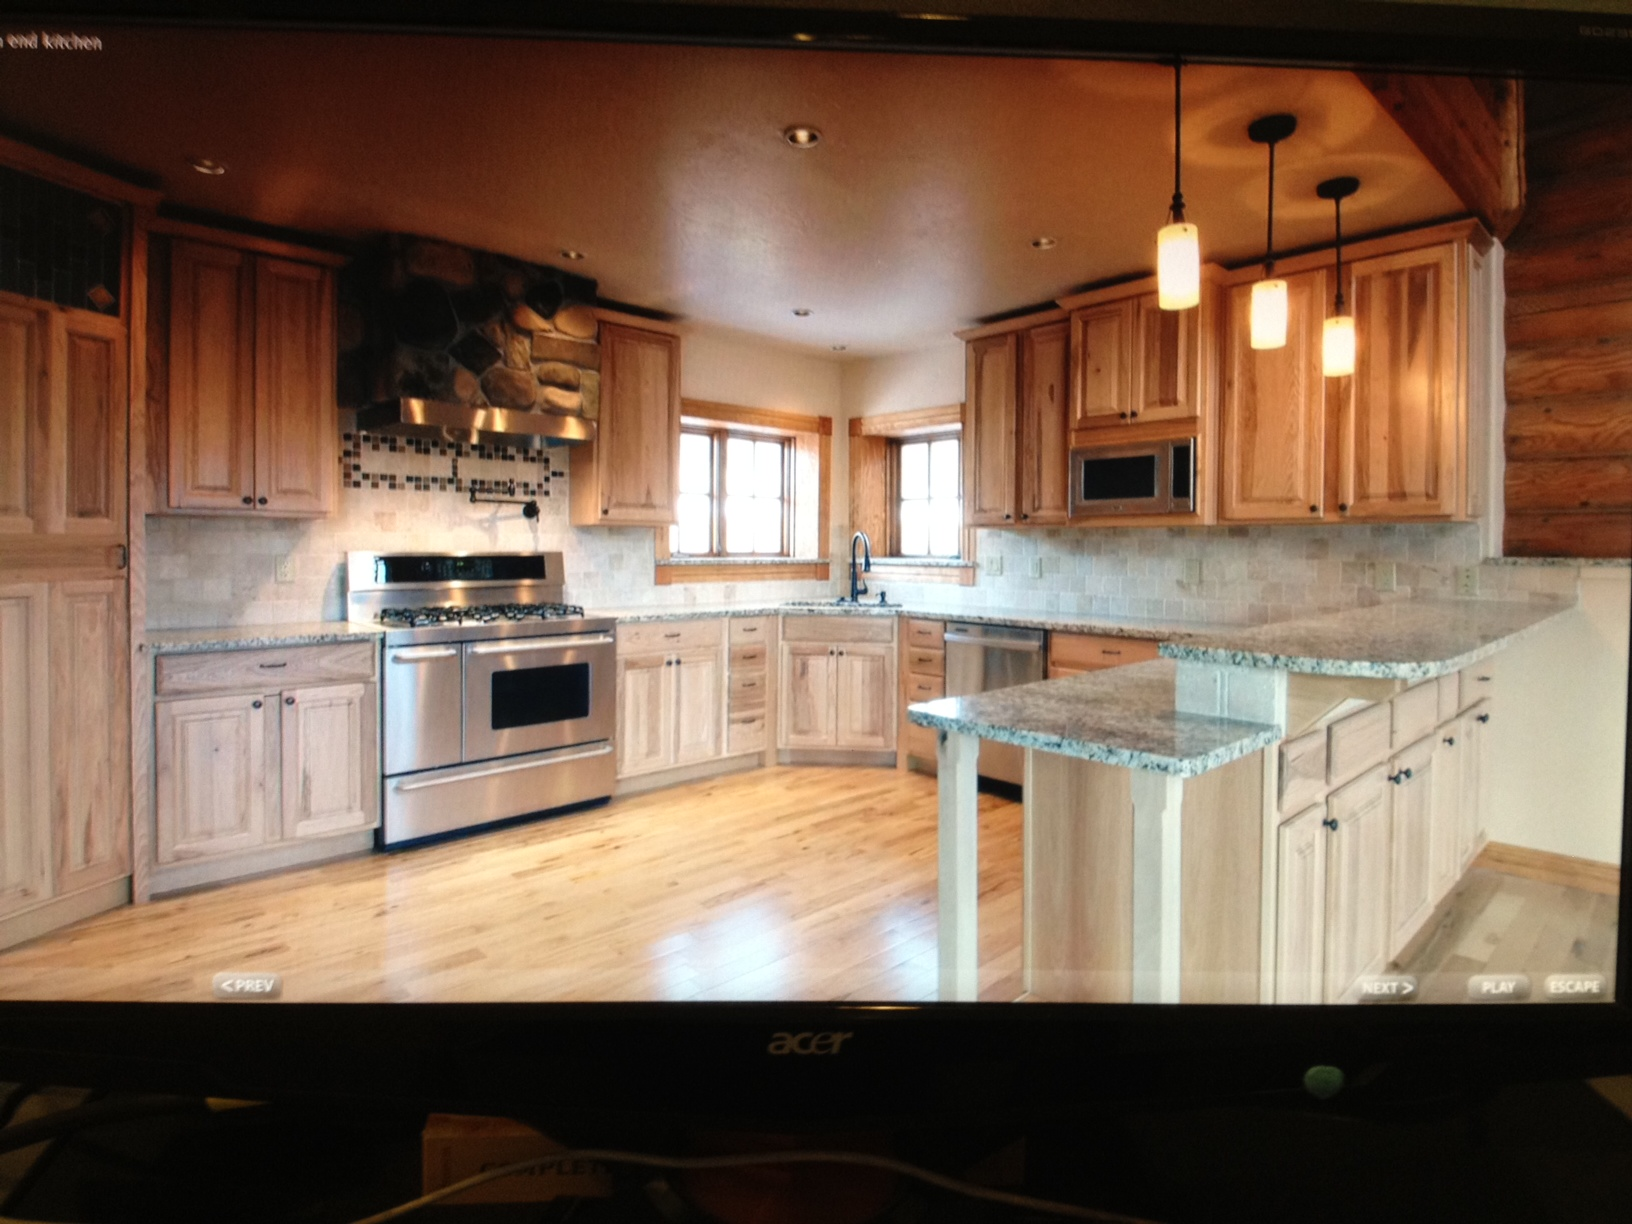 Price Of New Kitchen | Euffslemani.com